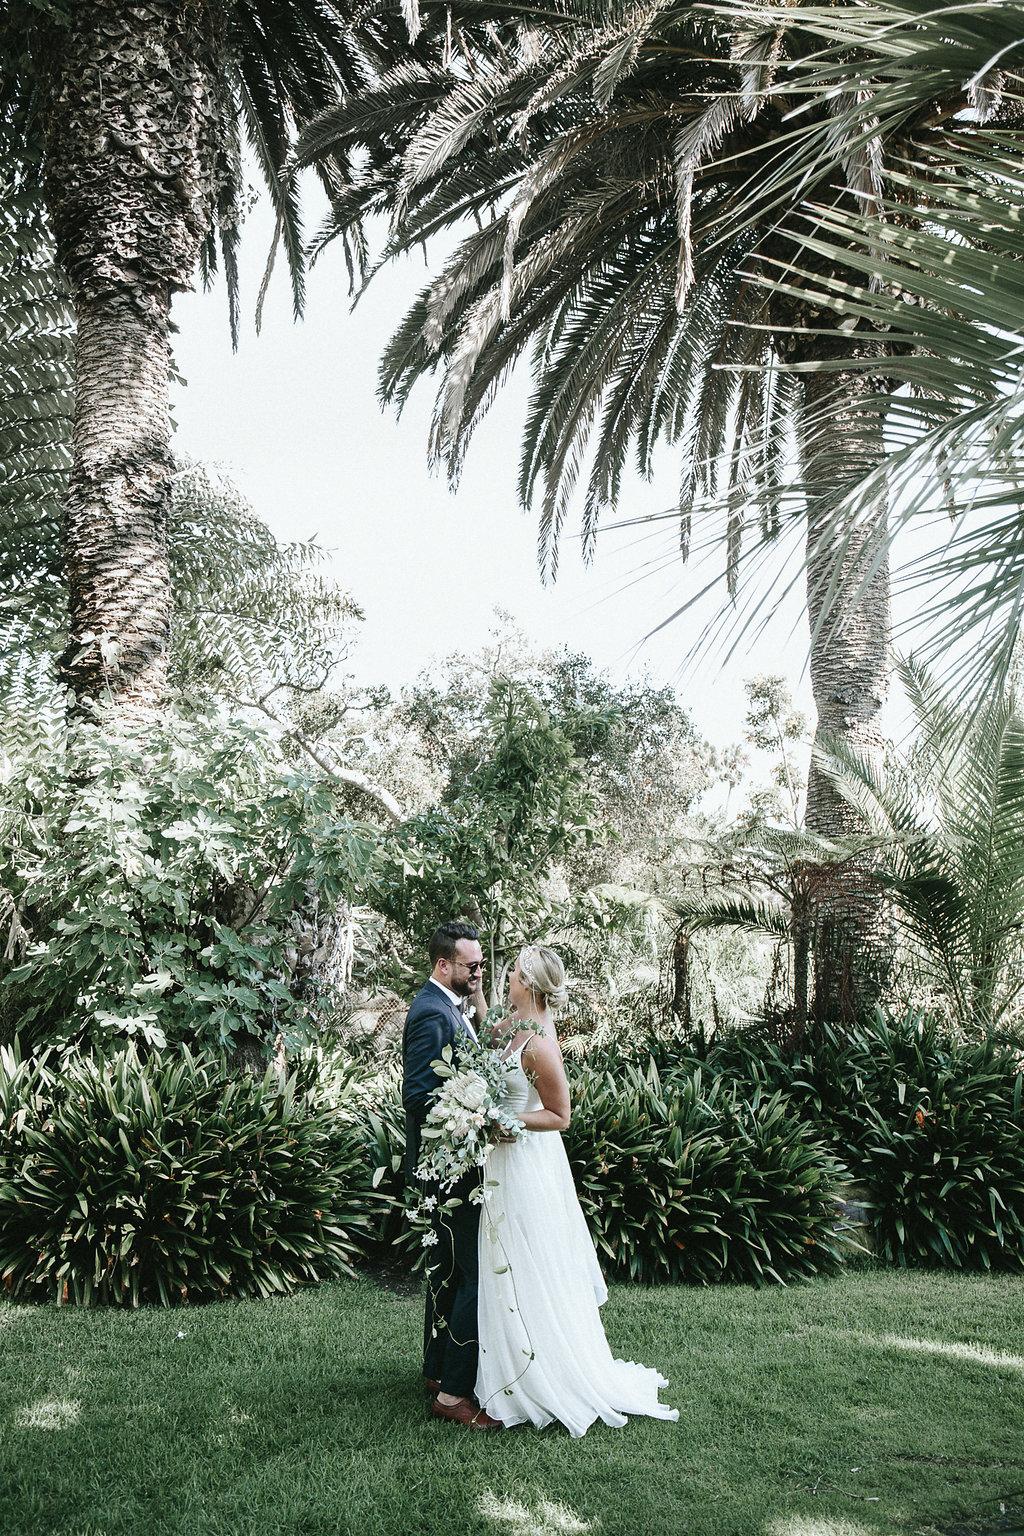 Lauren & Robert - Miramar Photography